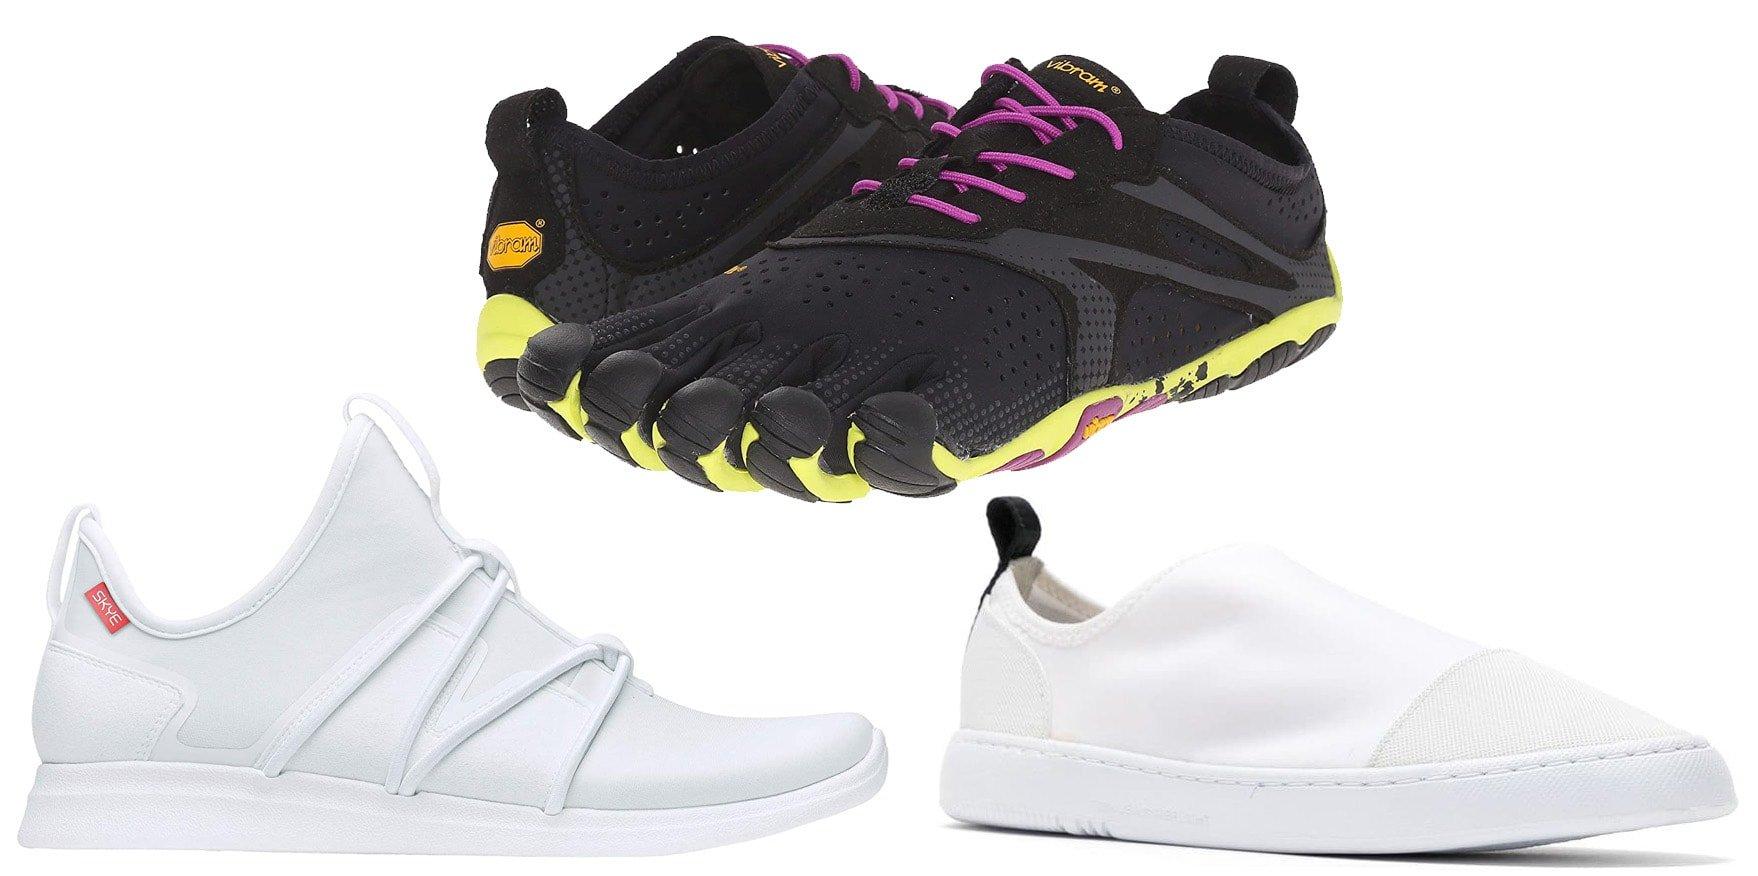 Skye The Rbutus sneakers, Vibram FiveFingers V-Run sneakers, Osklen Super Light lycra sneakers